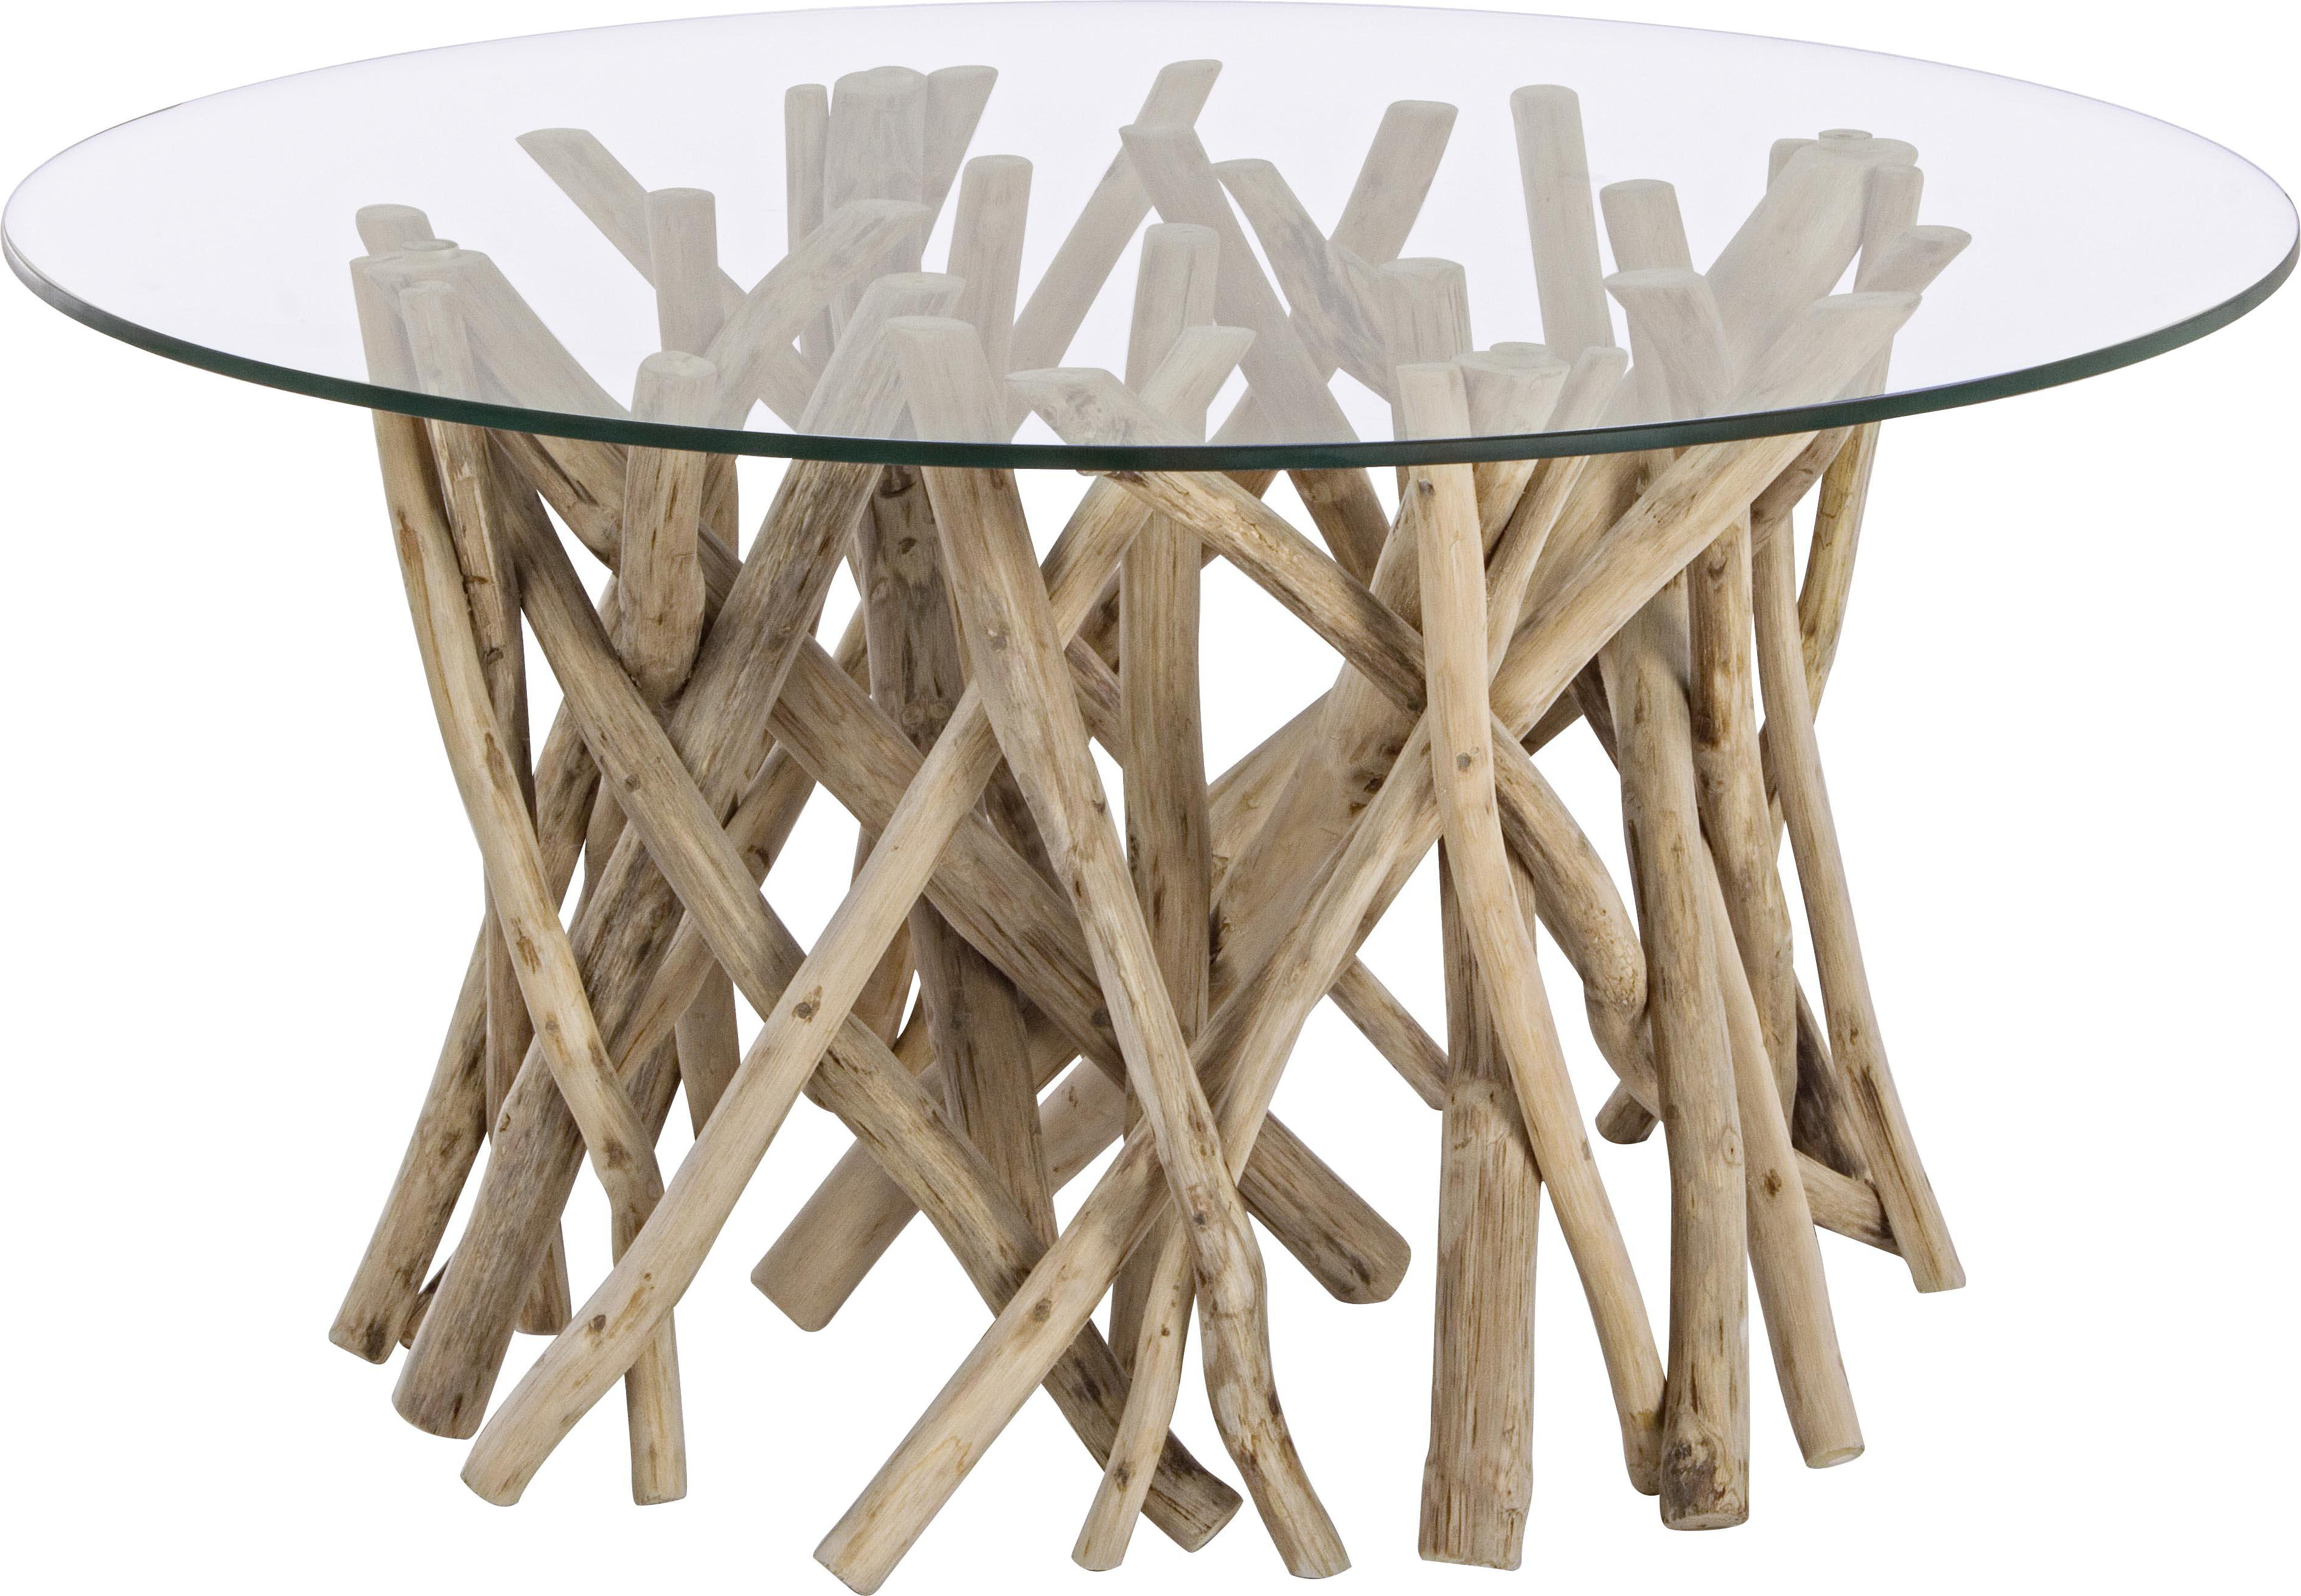 Mesa de centro de teca Samira, tablero de cristal, Tablero: vidrio templado, Estructura: madera de teca blanca y e, Transaparente, teca blanqueada patinada, An 80 x F 40 cm